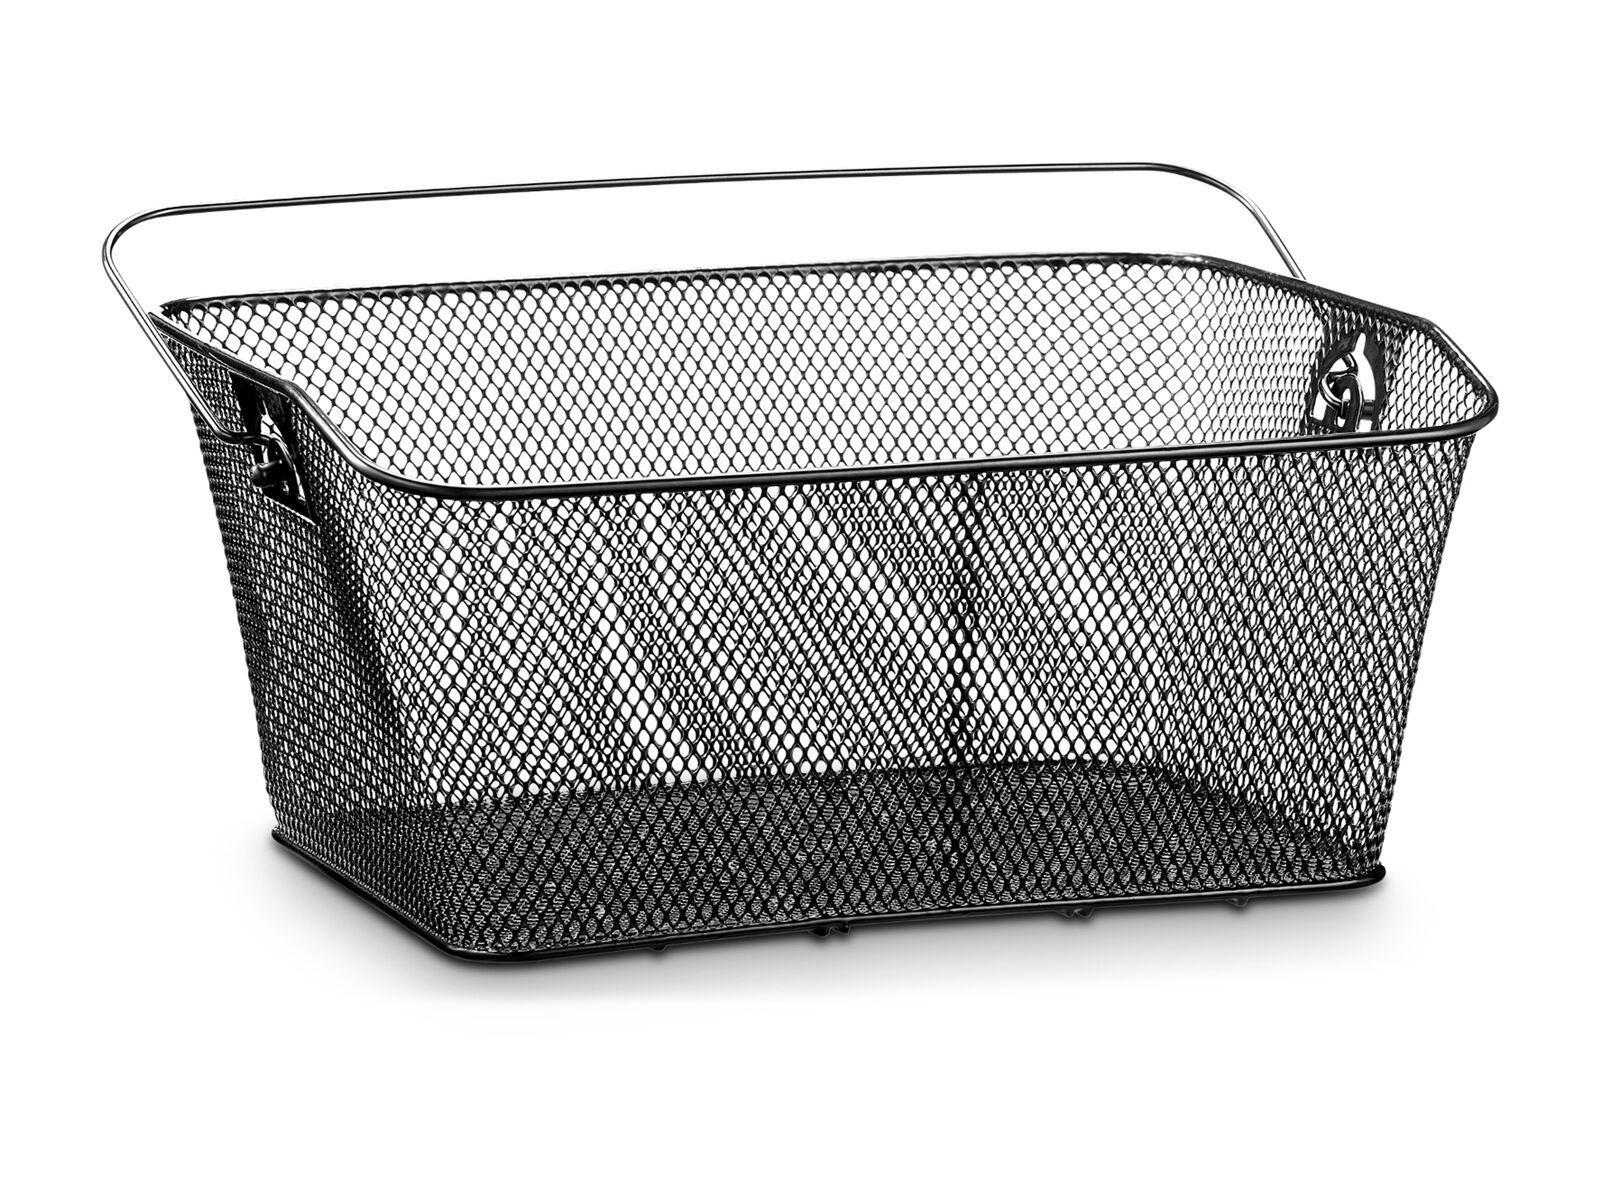 Cube RFR Korb Standard, black - Fahrradkorb 137800000